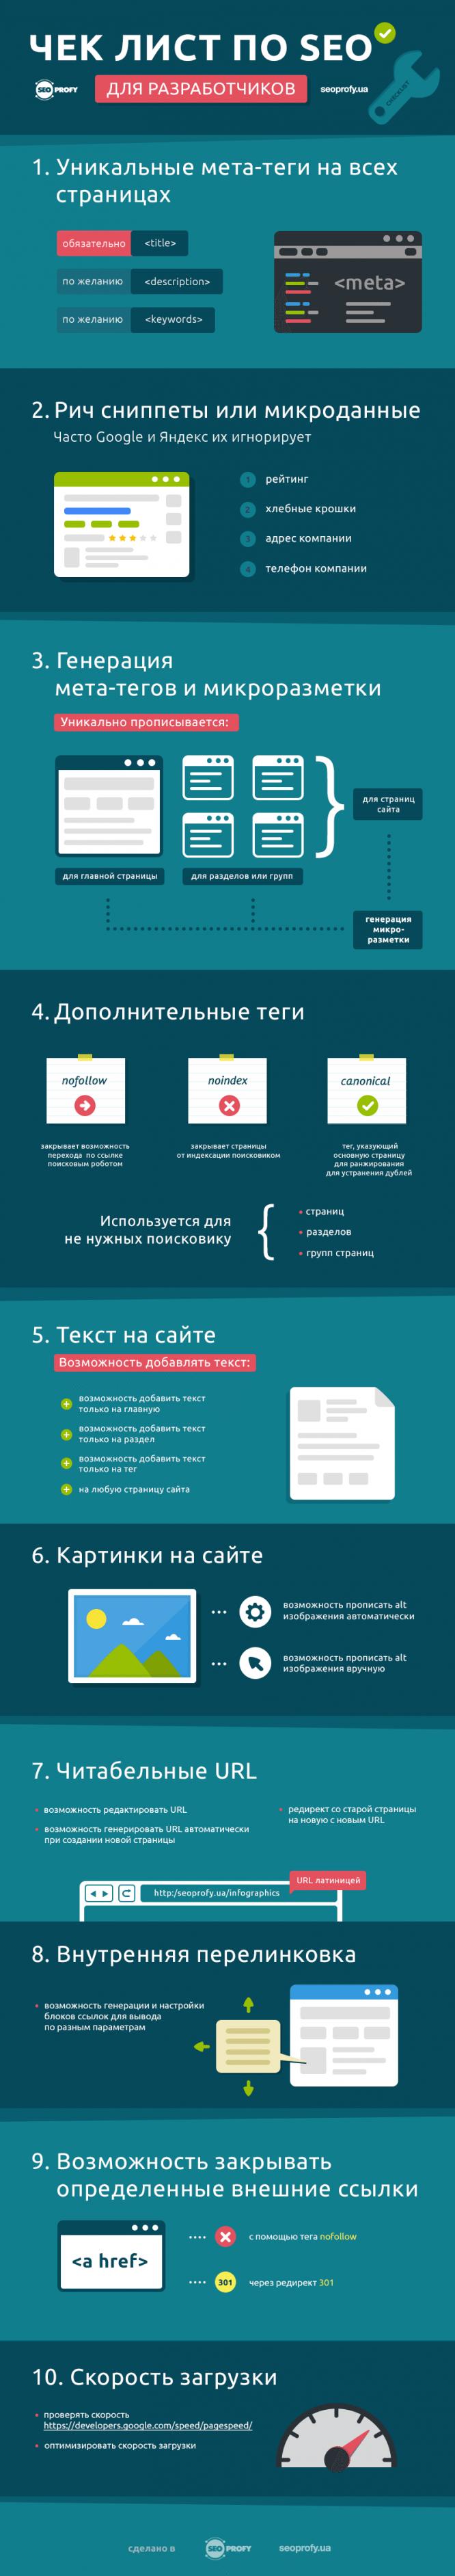 seo-checklist-for-dev1